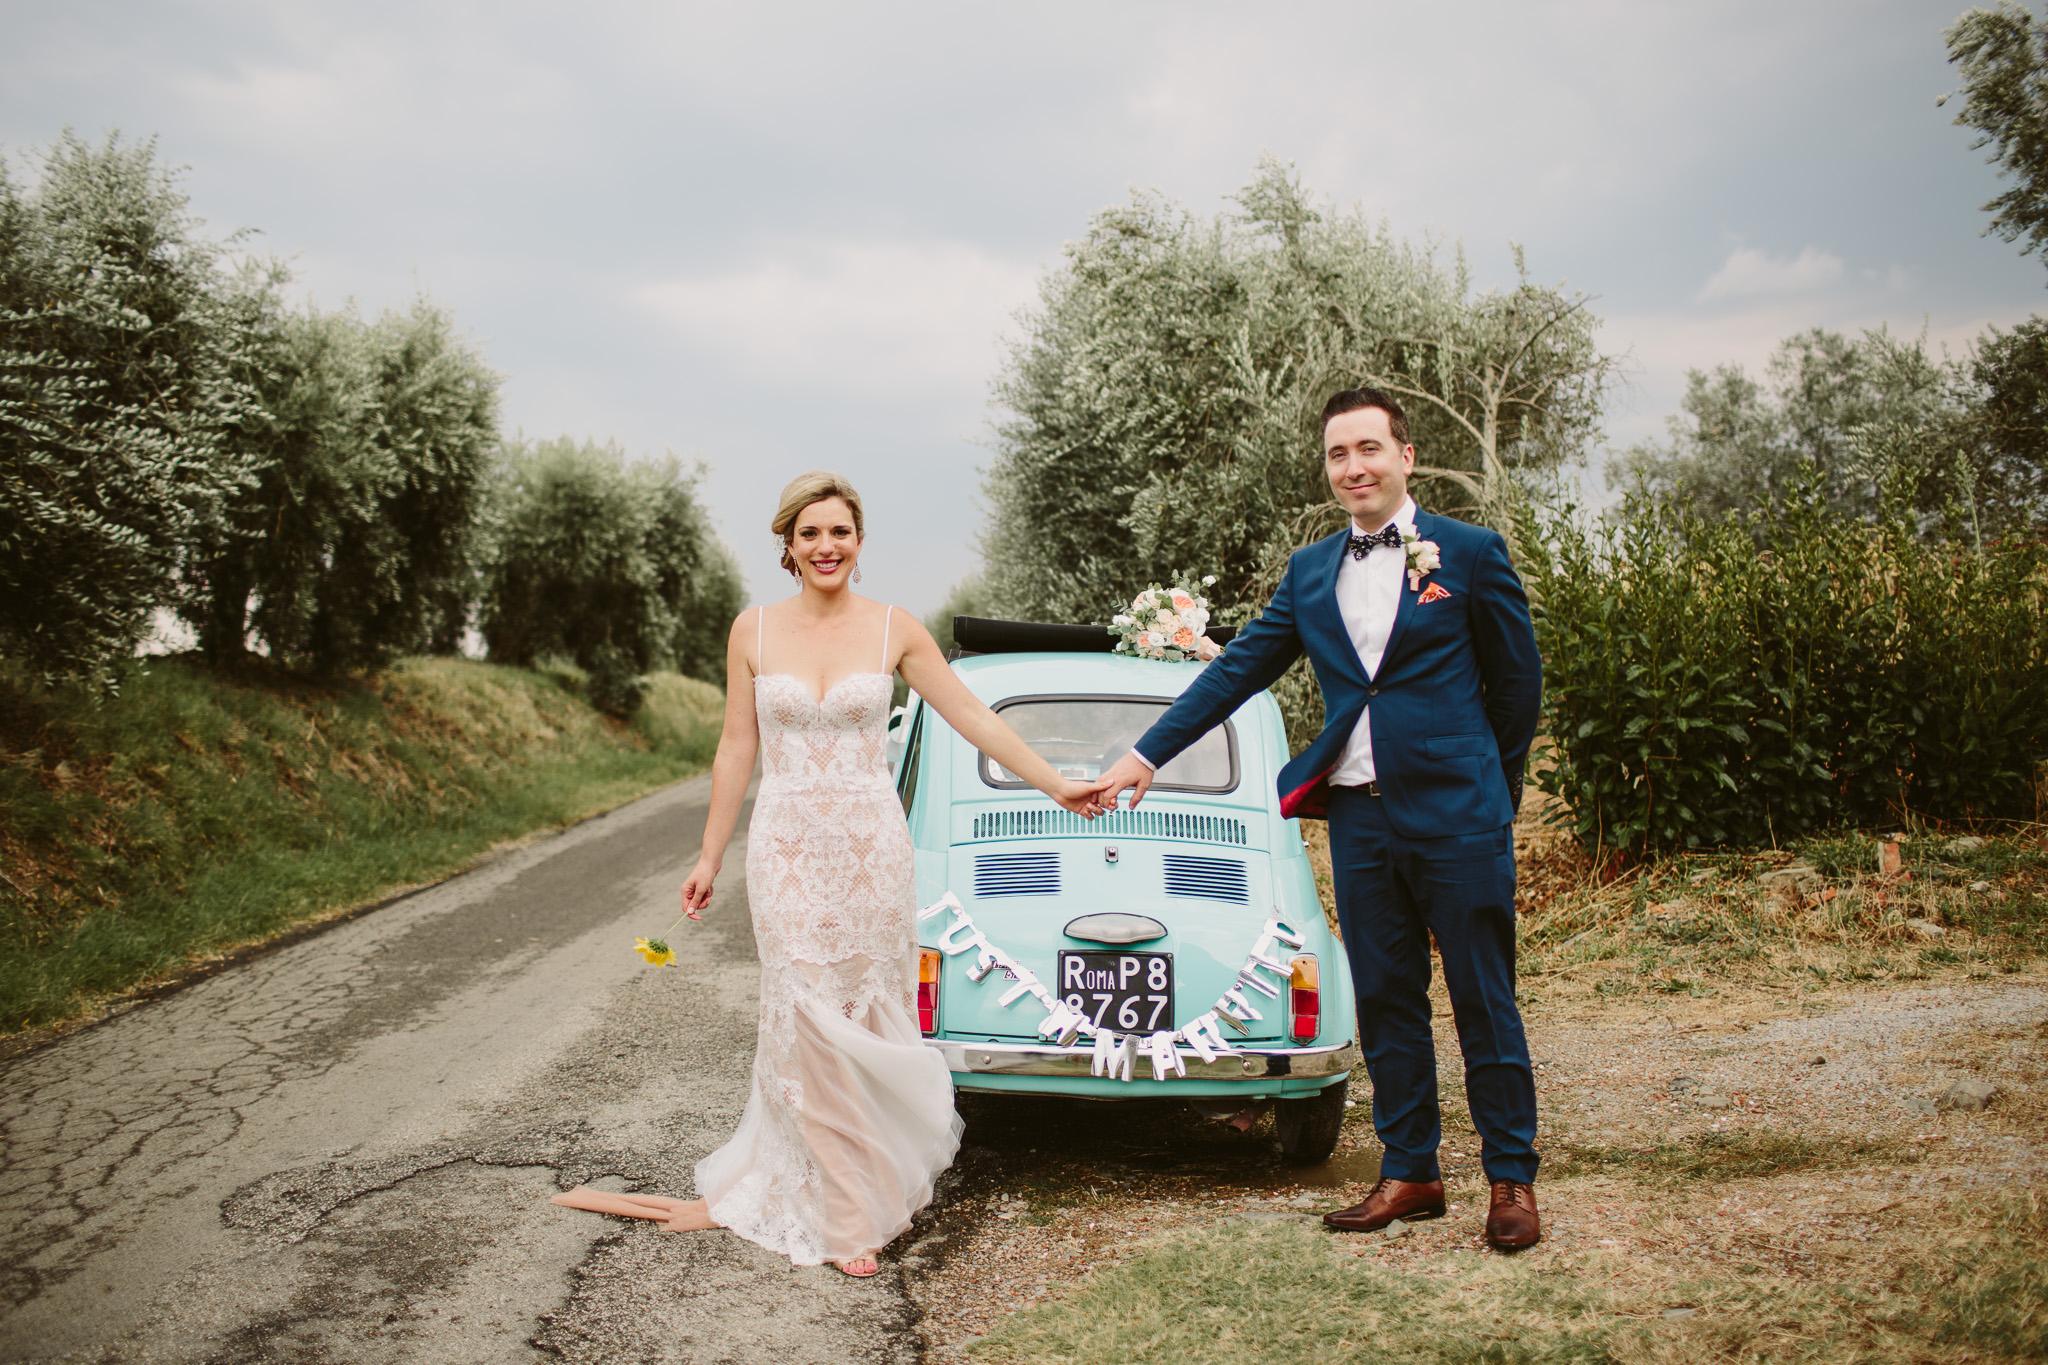 Jessica & Brendan - Cortona, Tuscany